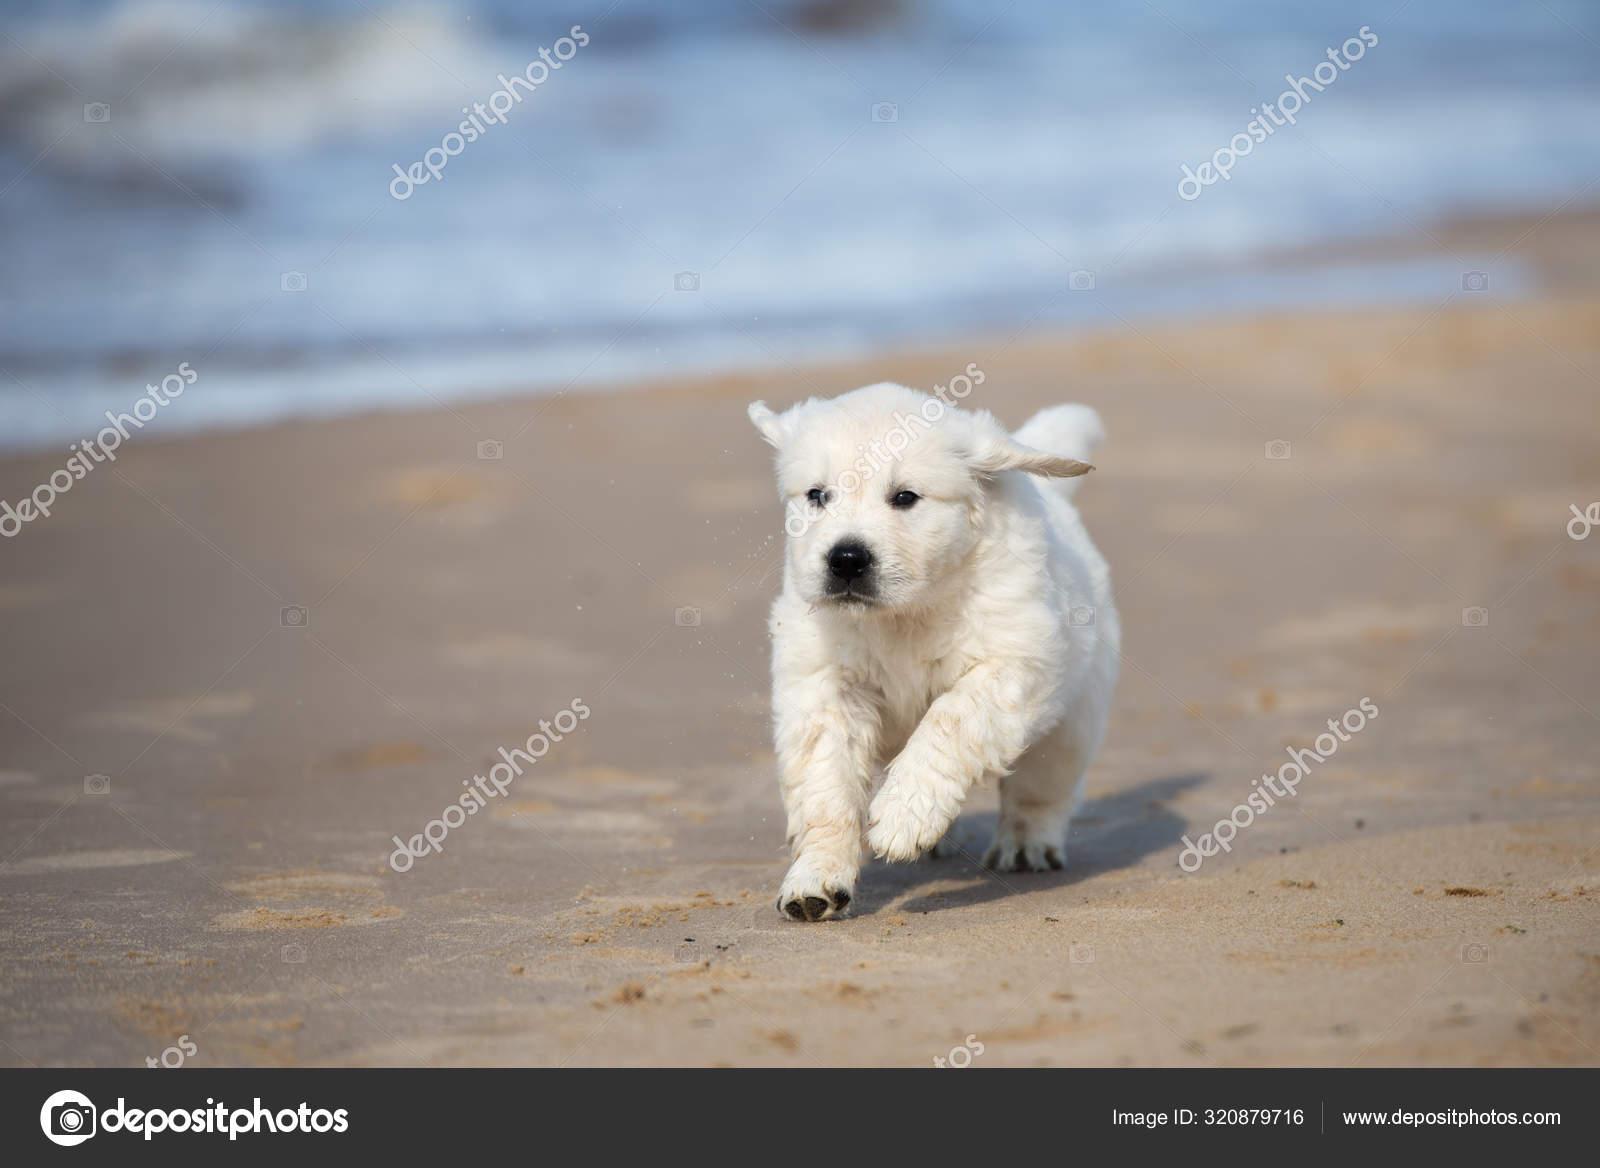 Happy Golden Retriever Puppy Walking Beach Sea Stock Photo C Ots Photo 320879716